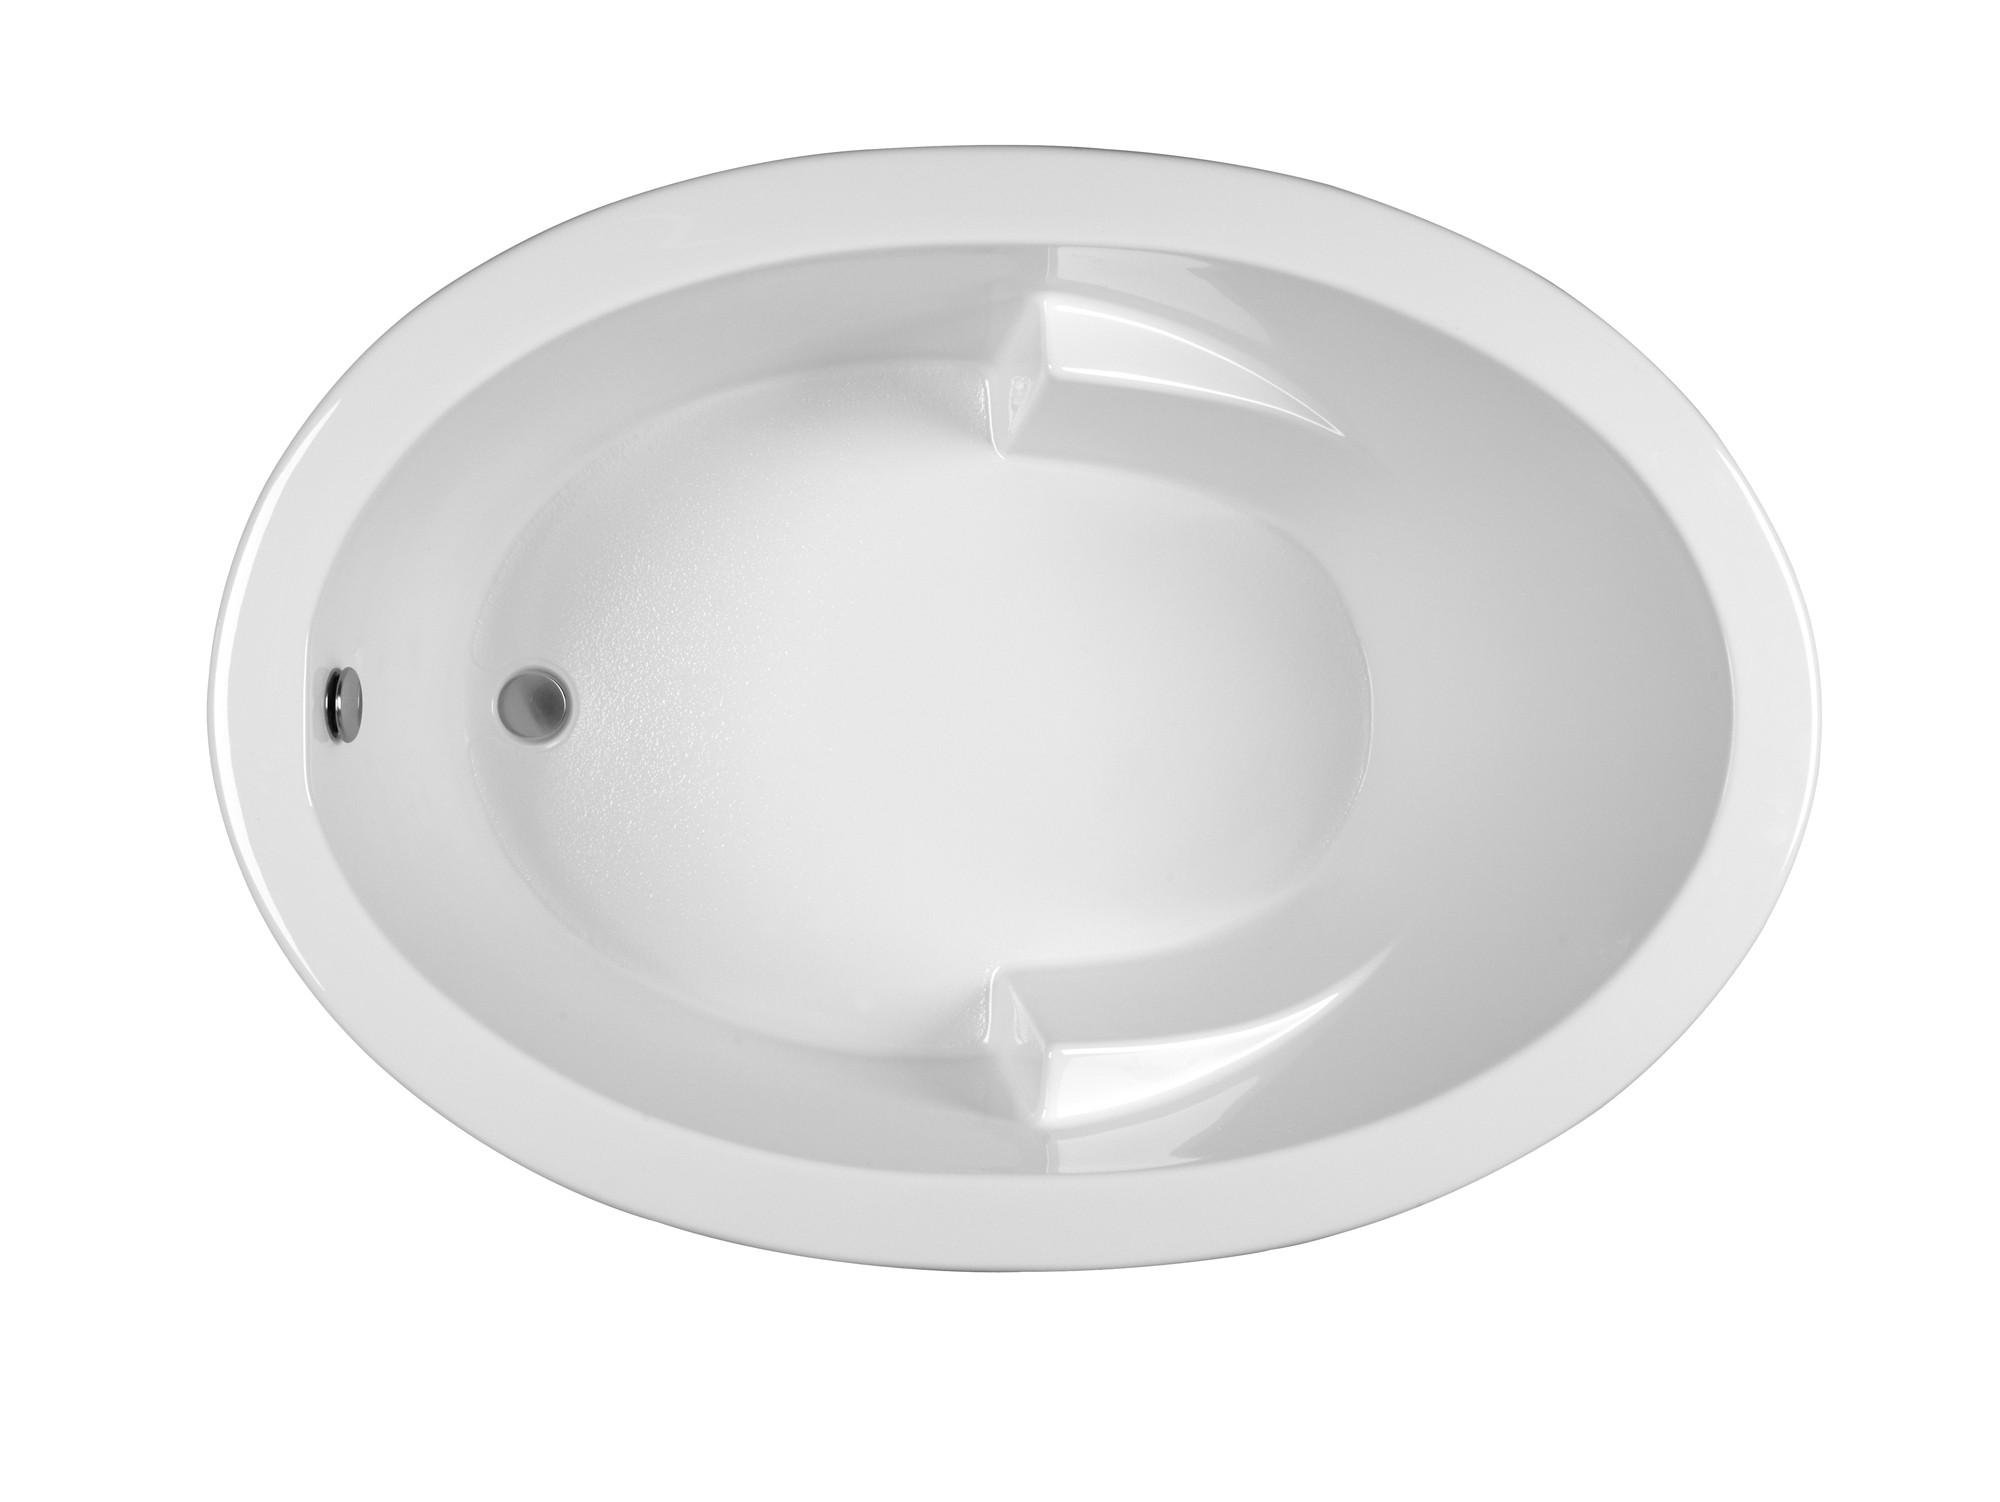 Reliance R6042ODIS 59.5 Inch Oval End Drain Soaking Bath